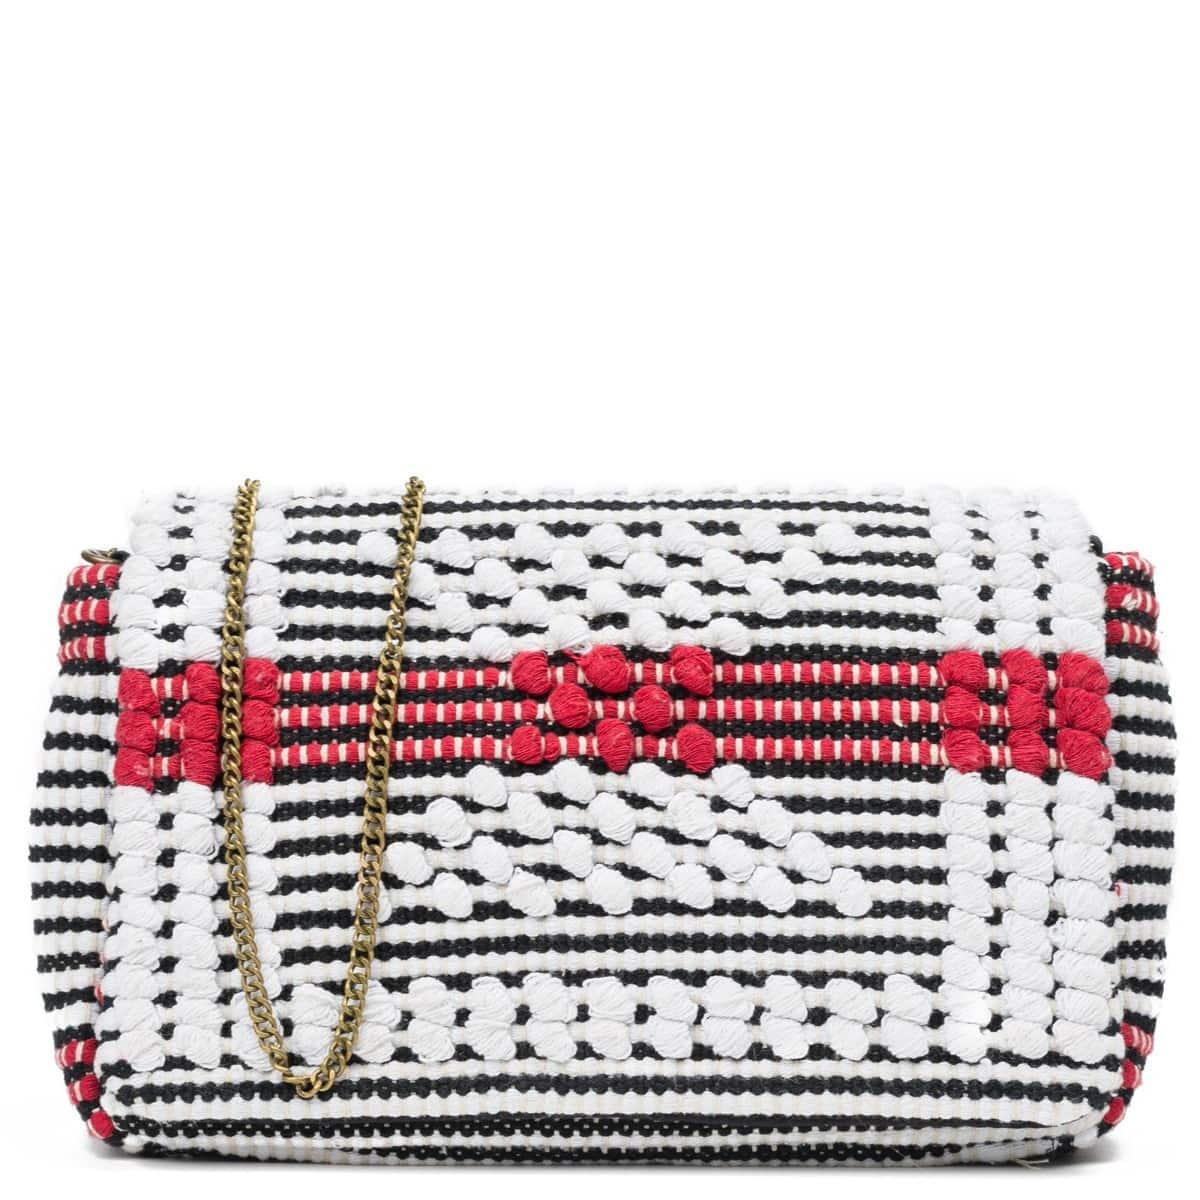 MIGATO KR882-L87 woven handbag